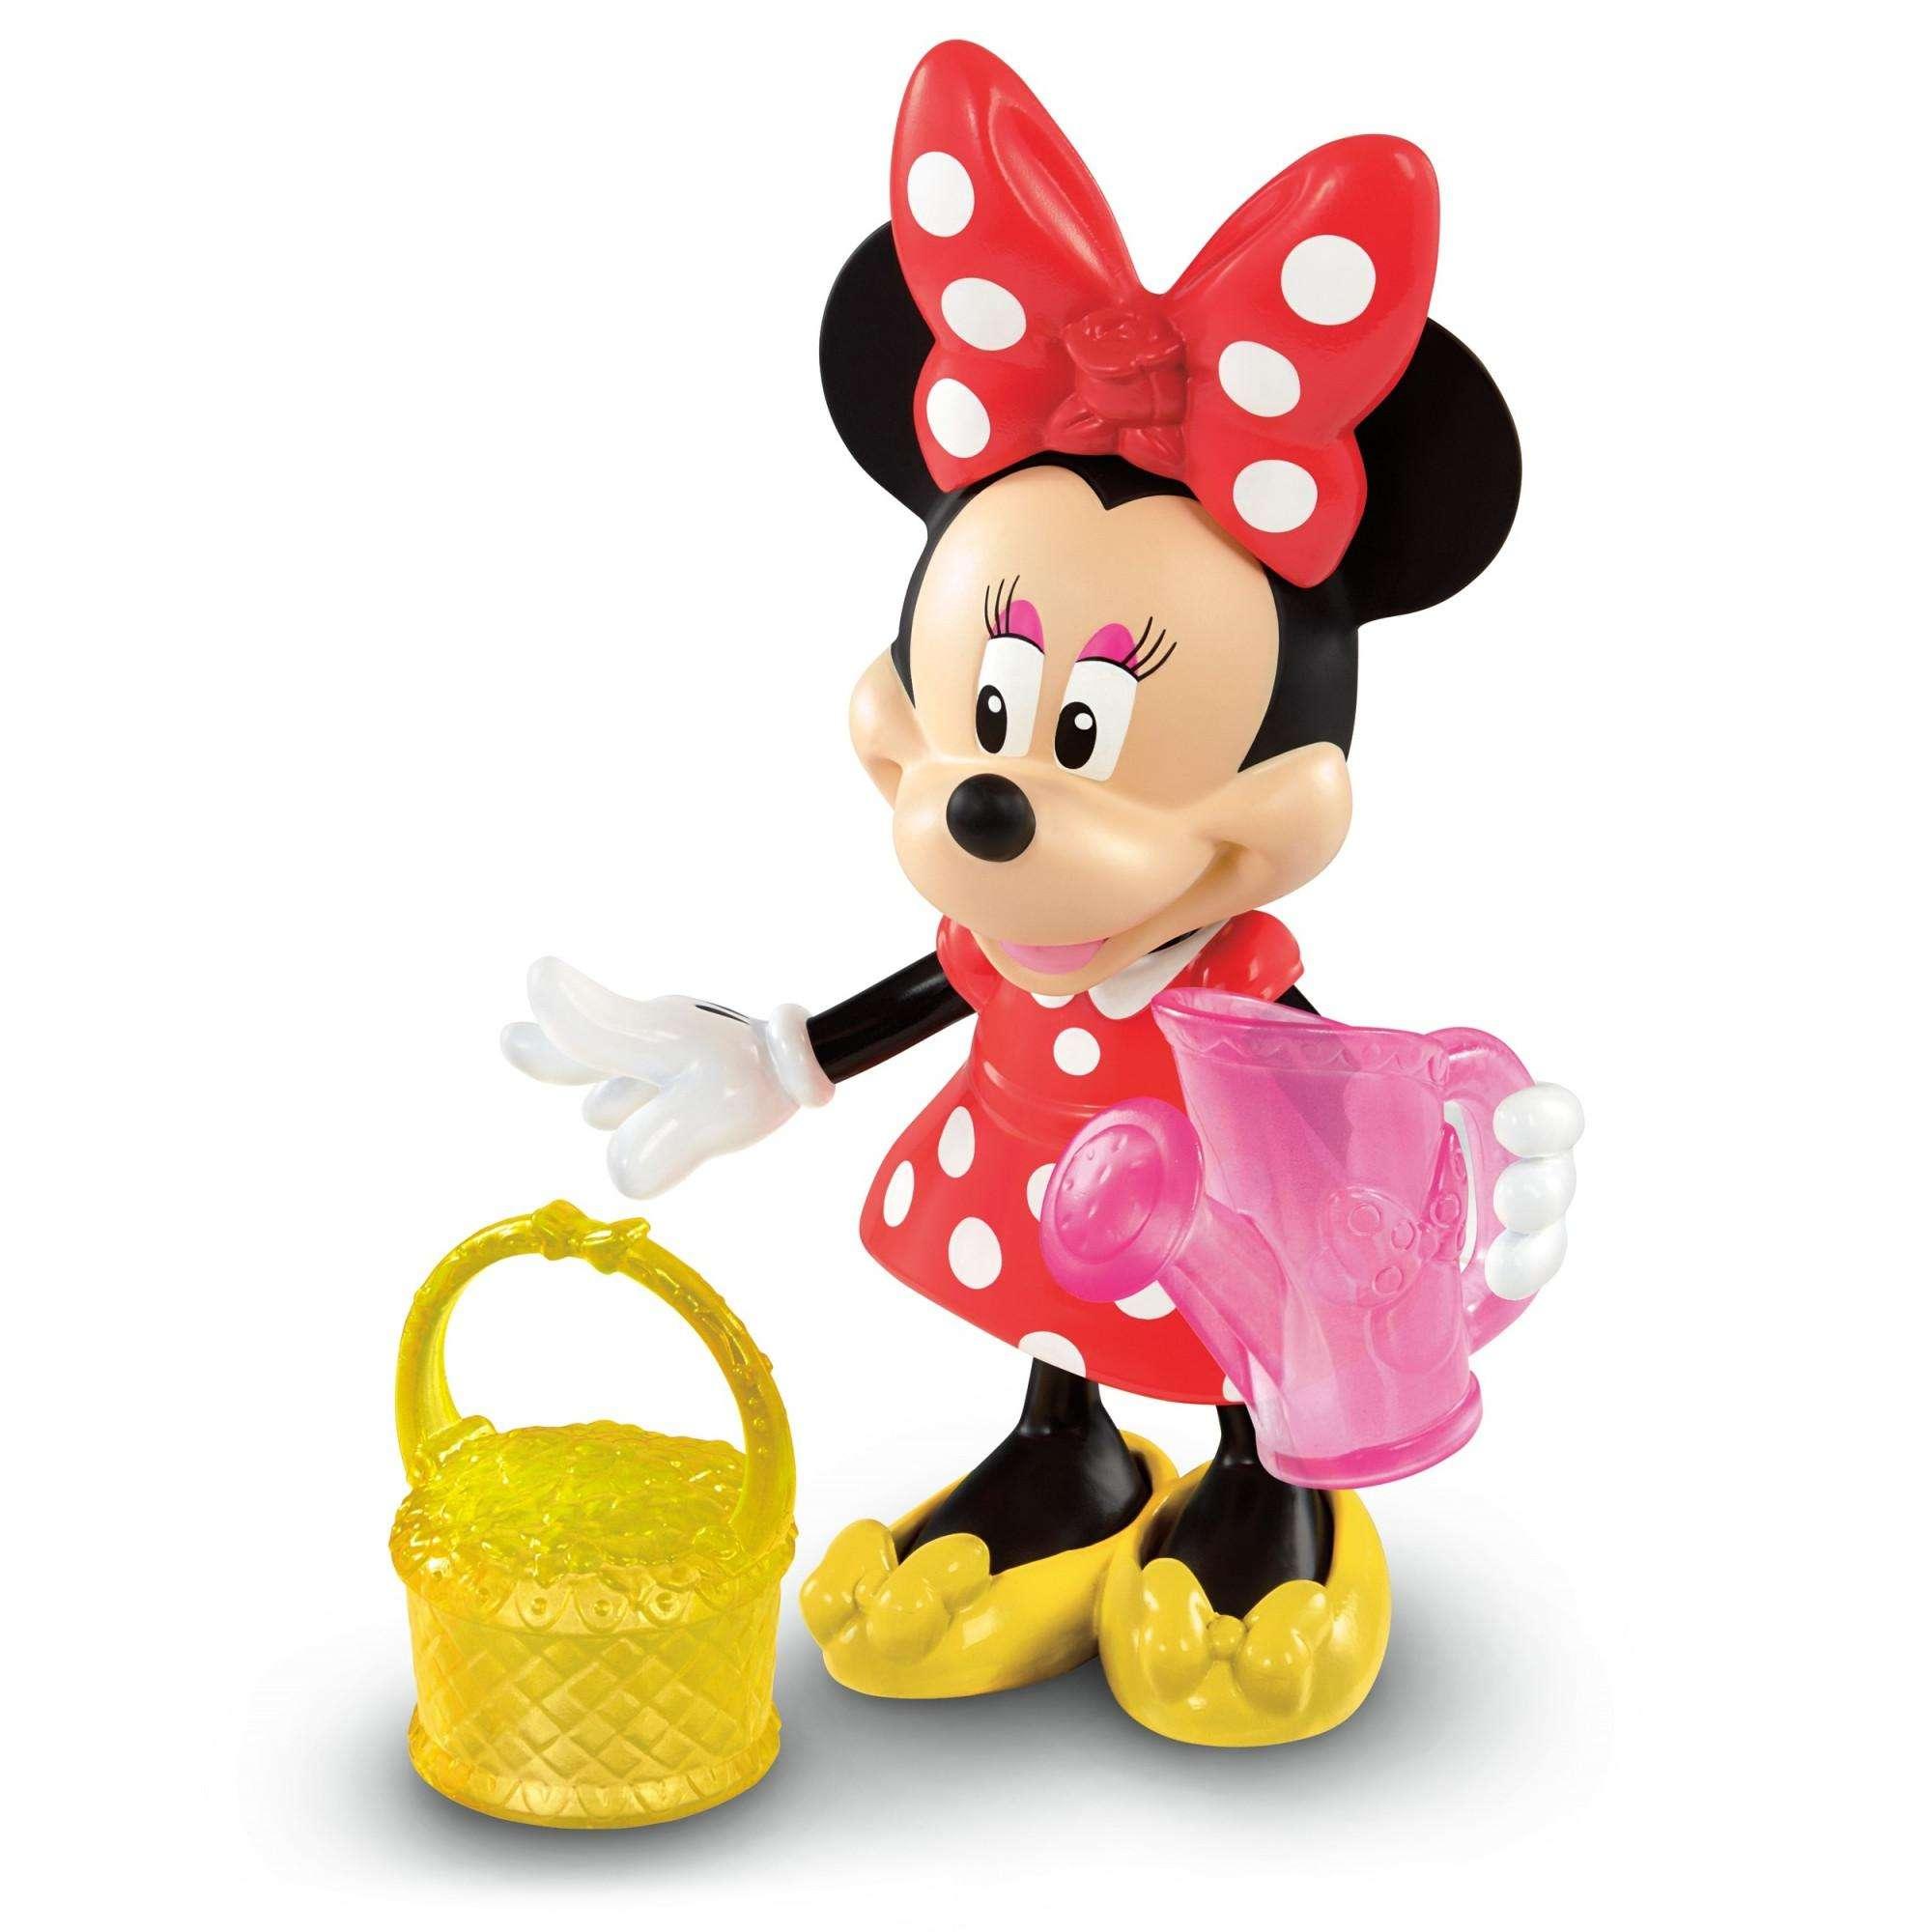 Disney Minnie Mouse Flower Garden Bow-Tique Play Set